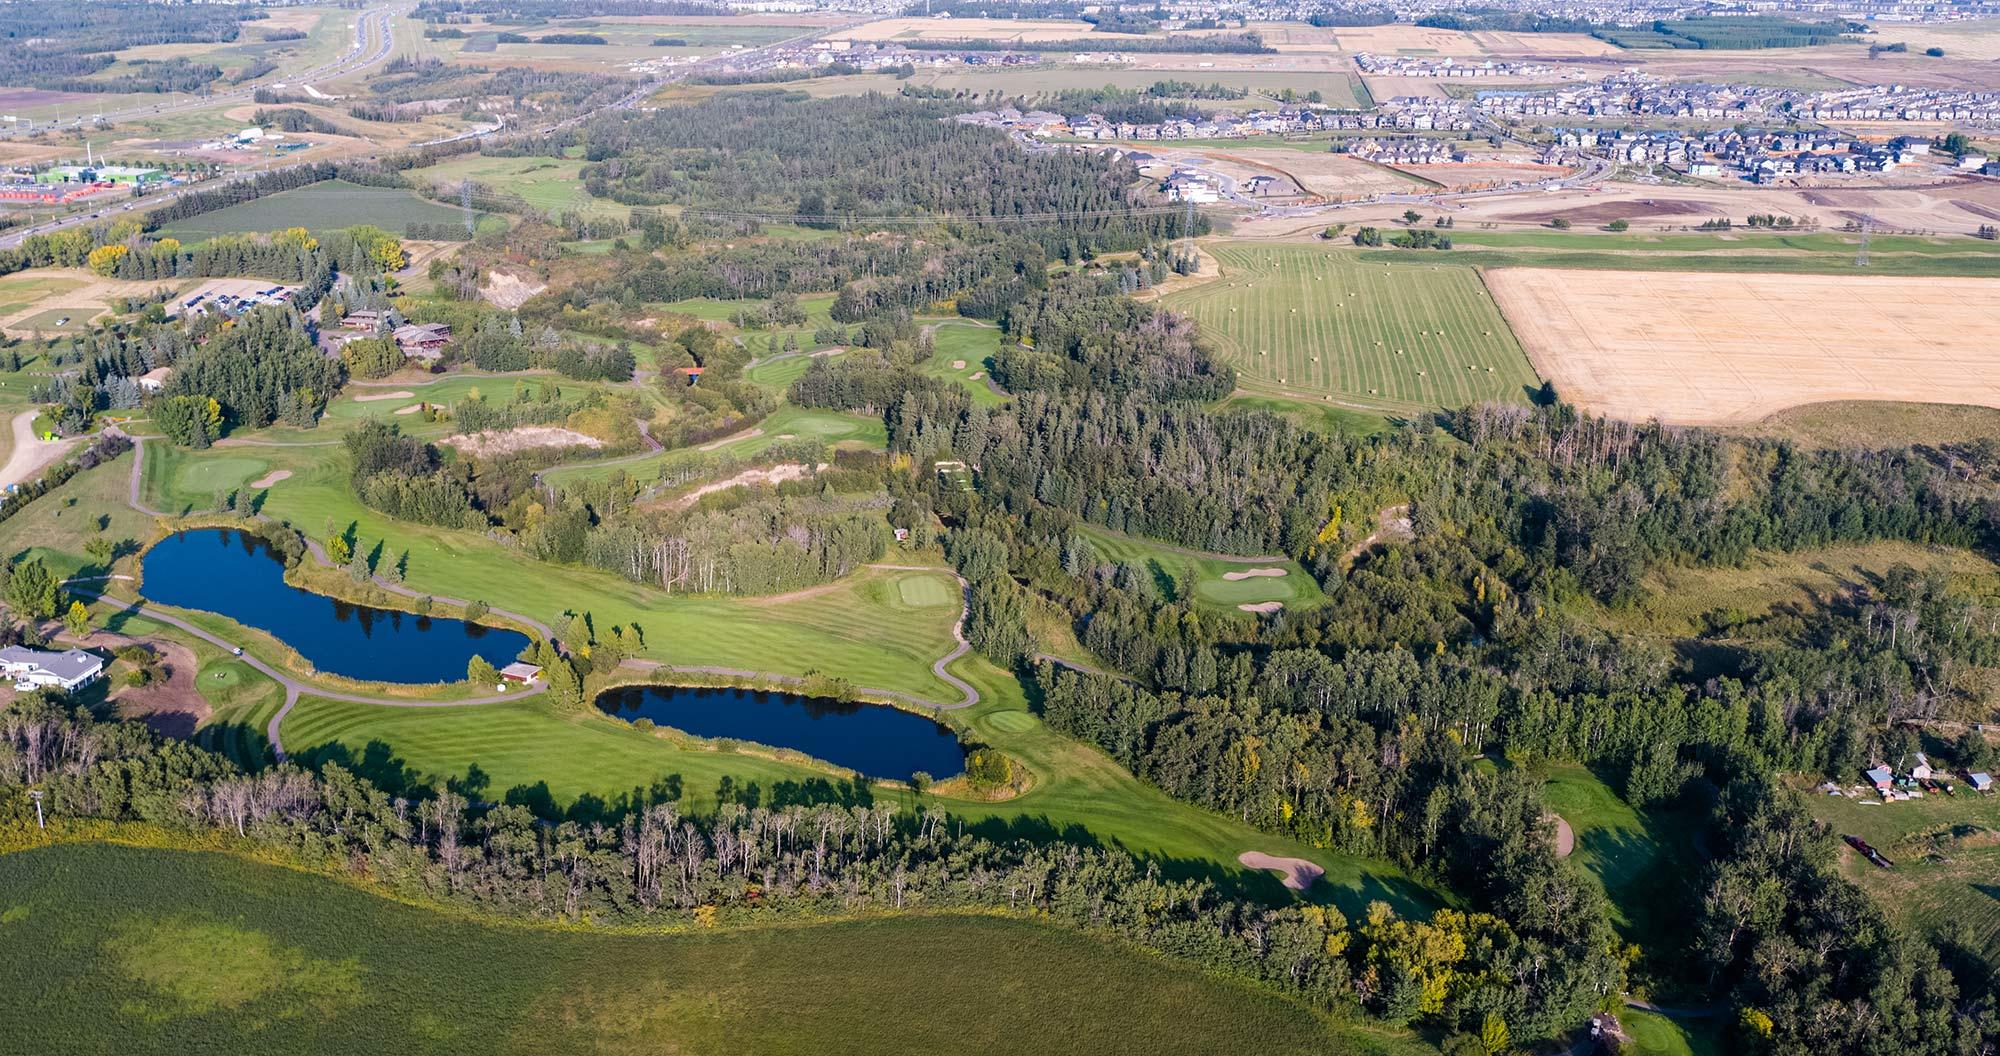 Glenridding Ravine Aerial Photograph